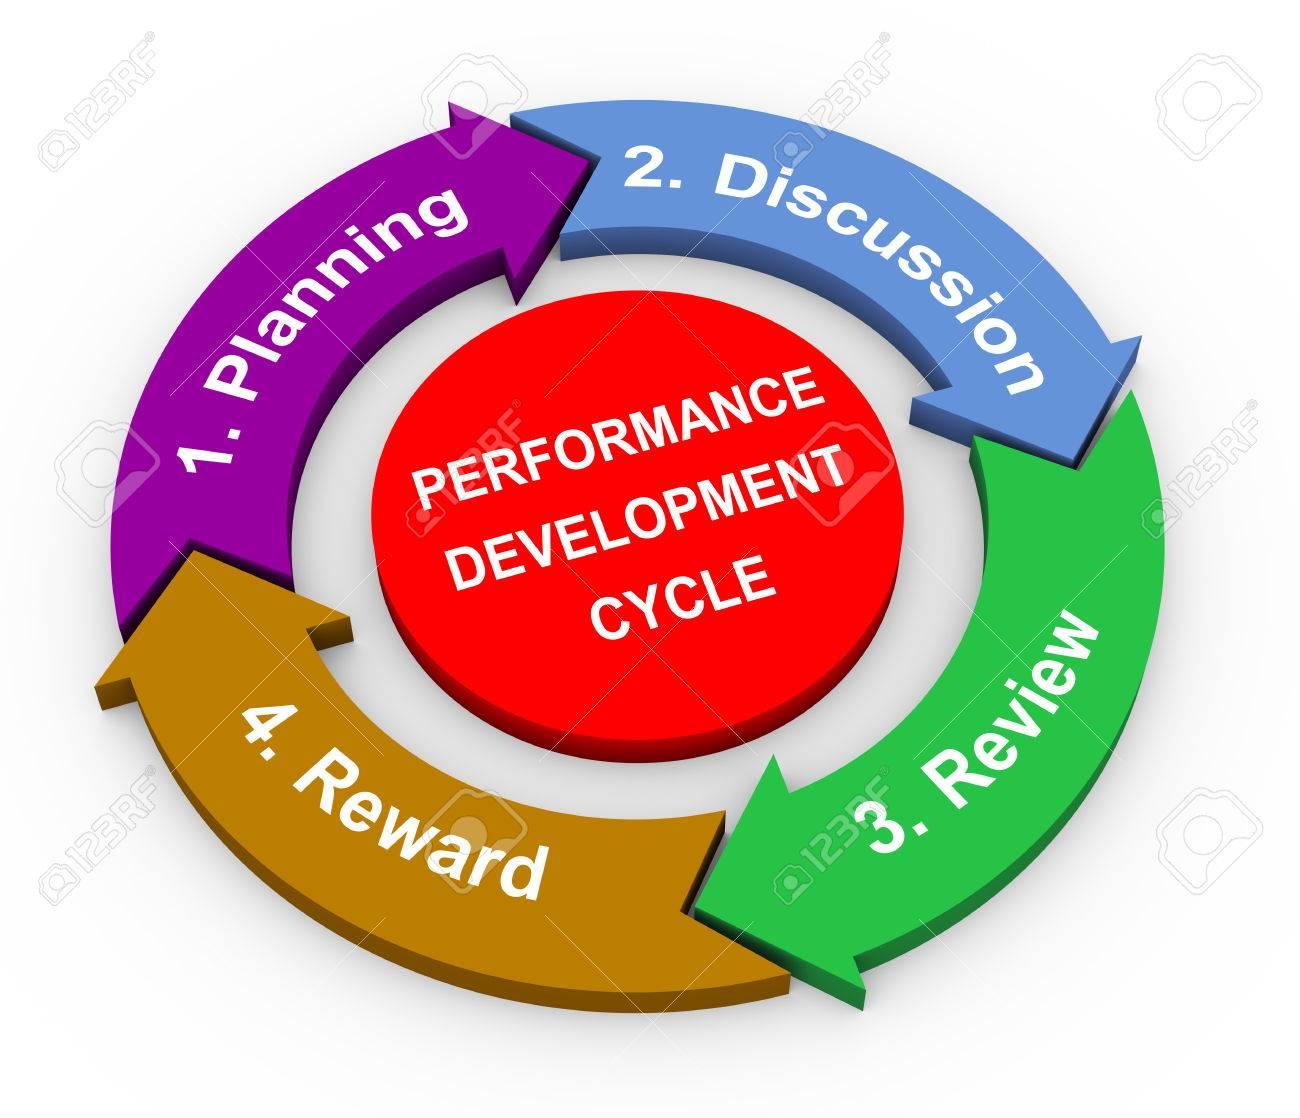 3d rendering of circular flow chart diagram of performance 3d rendering of circular flow chart diagram of performance development cycle stock photo 26544906 nvjuhfo Images